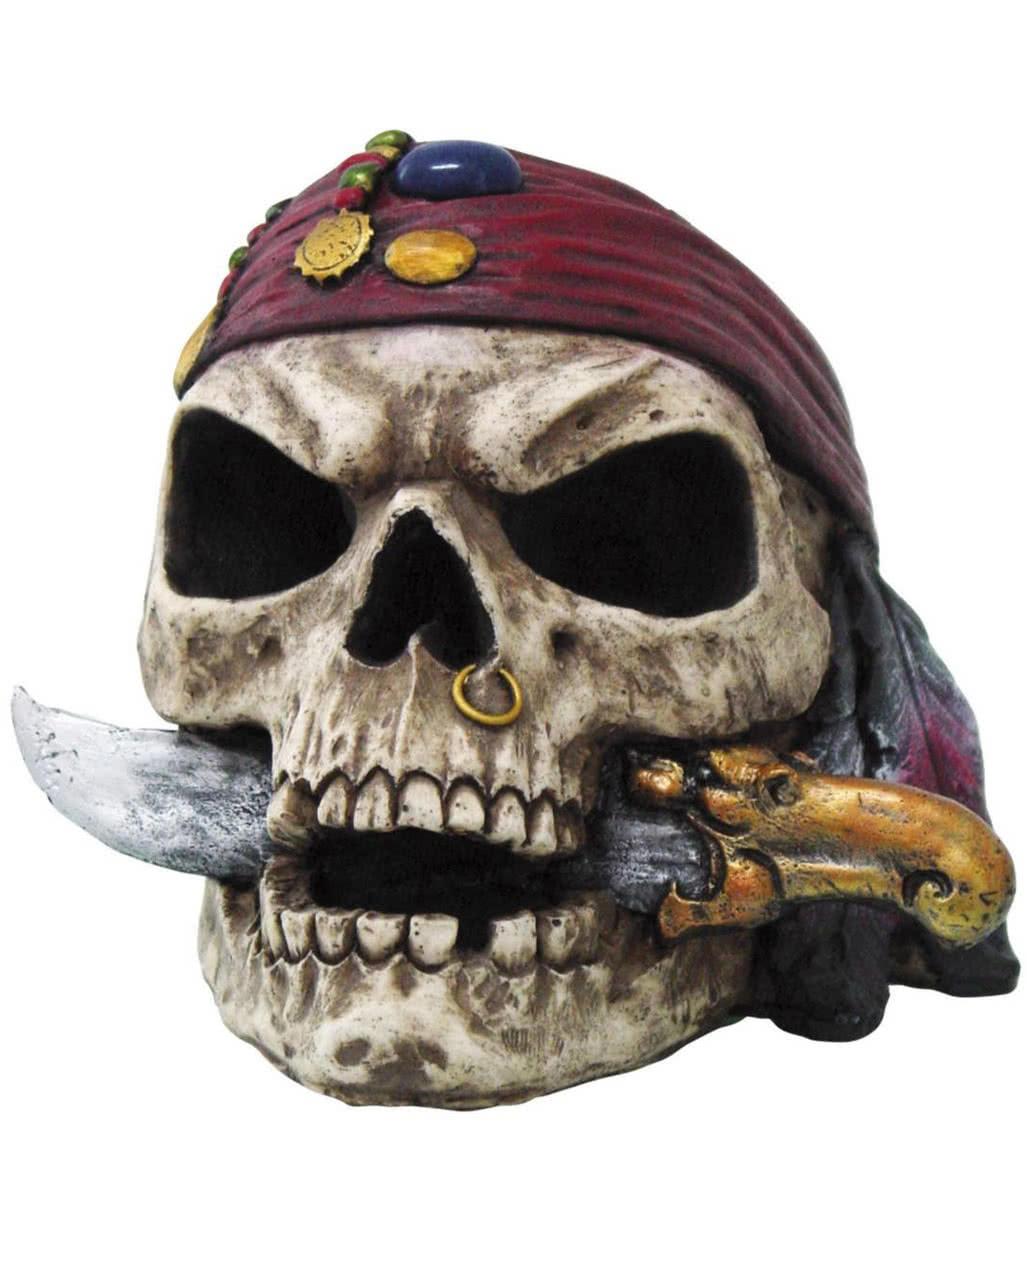 Maske Skull Pirate Kinder Totenkopf Freibeuter Accessoire Karneval